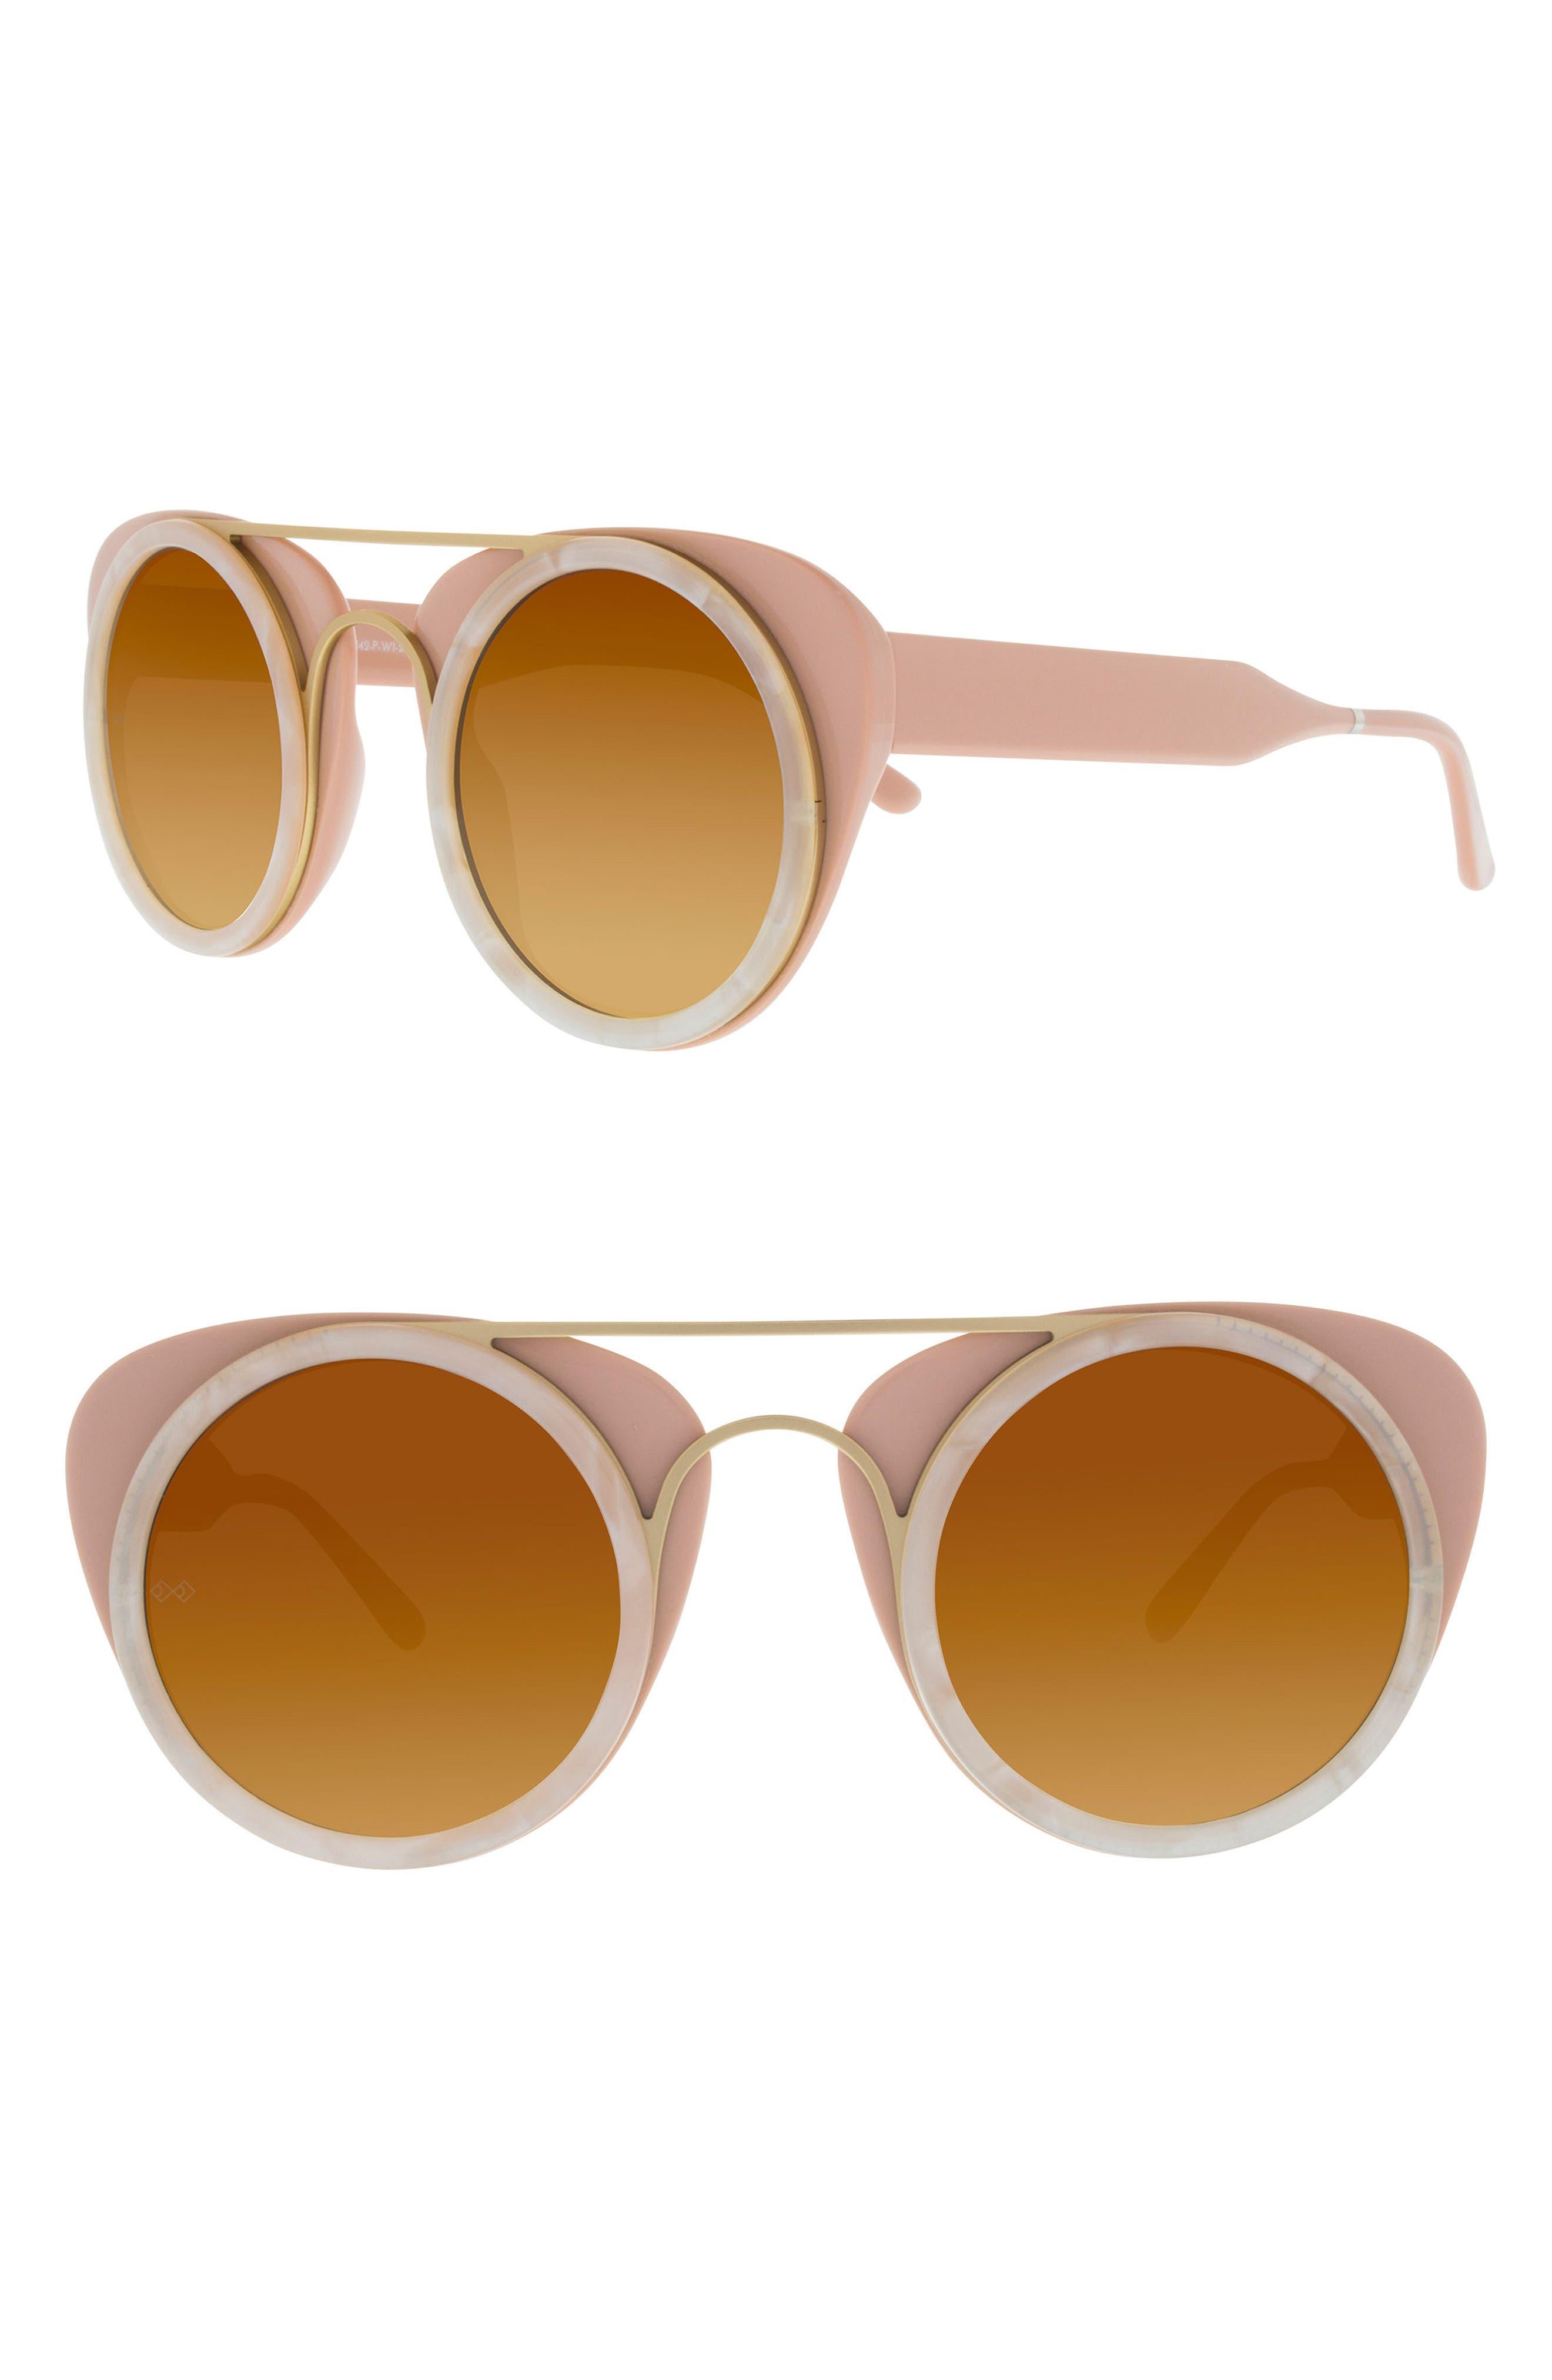 Alternate Image 1 Selected - SMOKE X MIRRORS Soda Pop 3 47mm Round Sunglasses